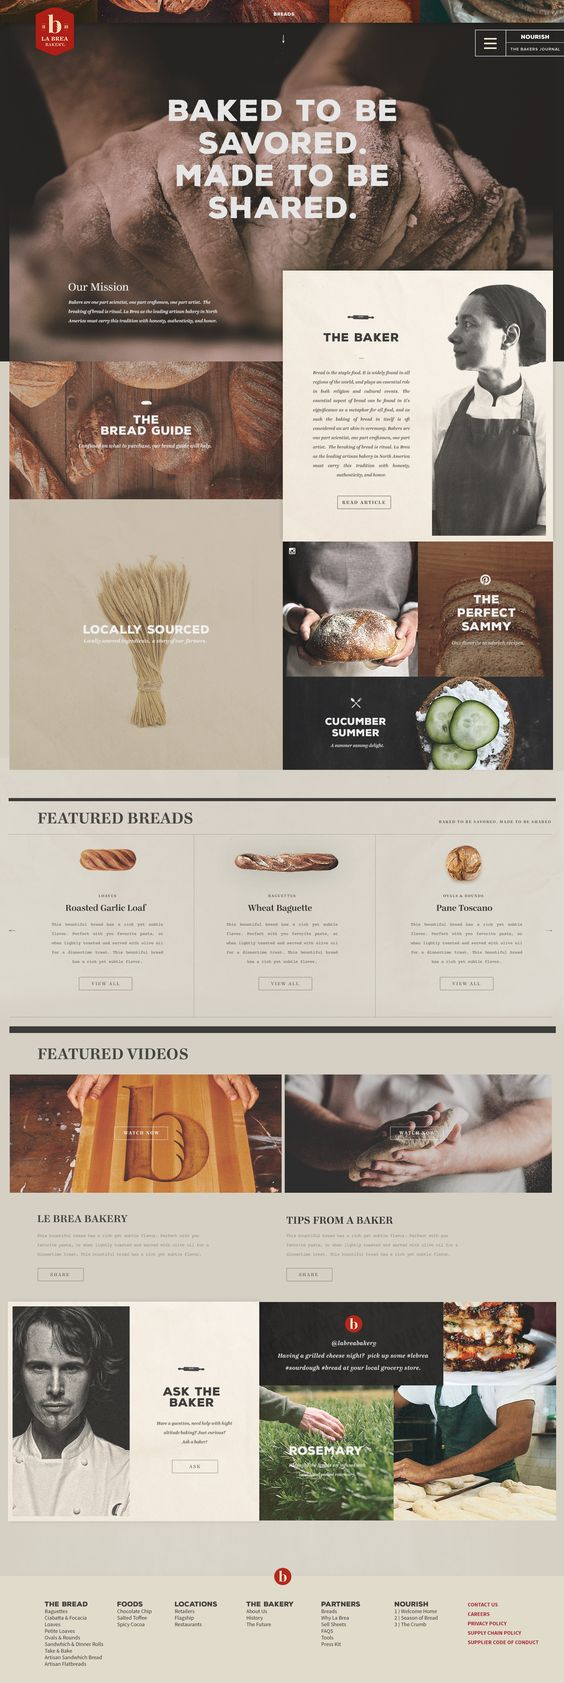 La Brea Bakery. Still a concept website. #webdesign #design (View more at www.aldenchong.com)